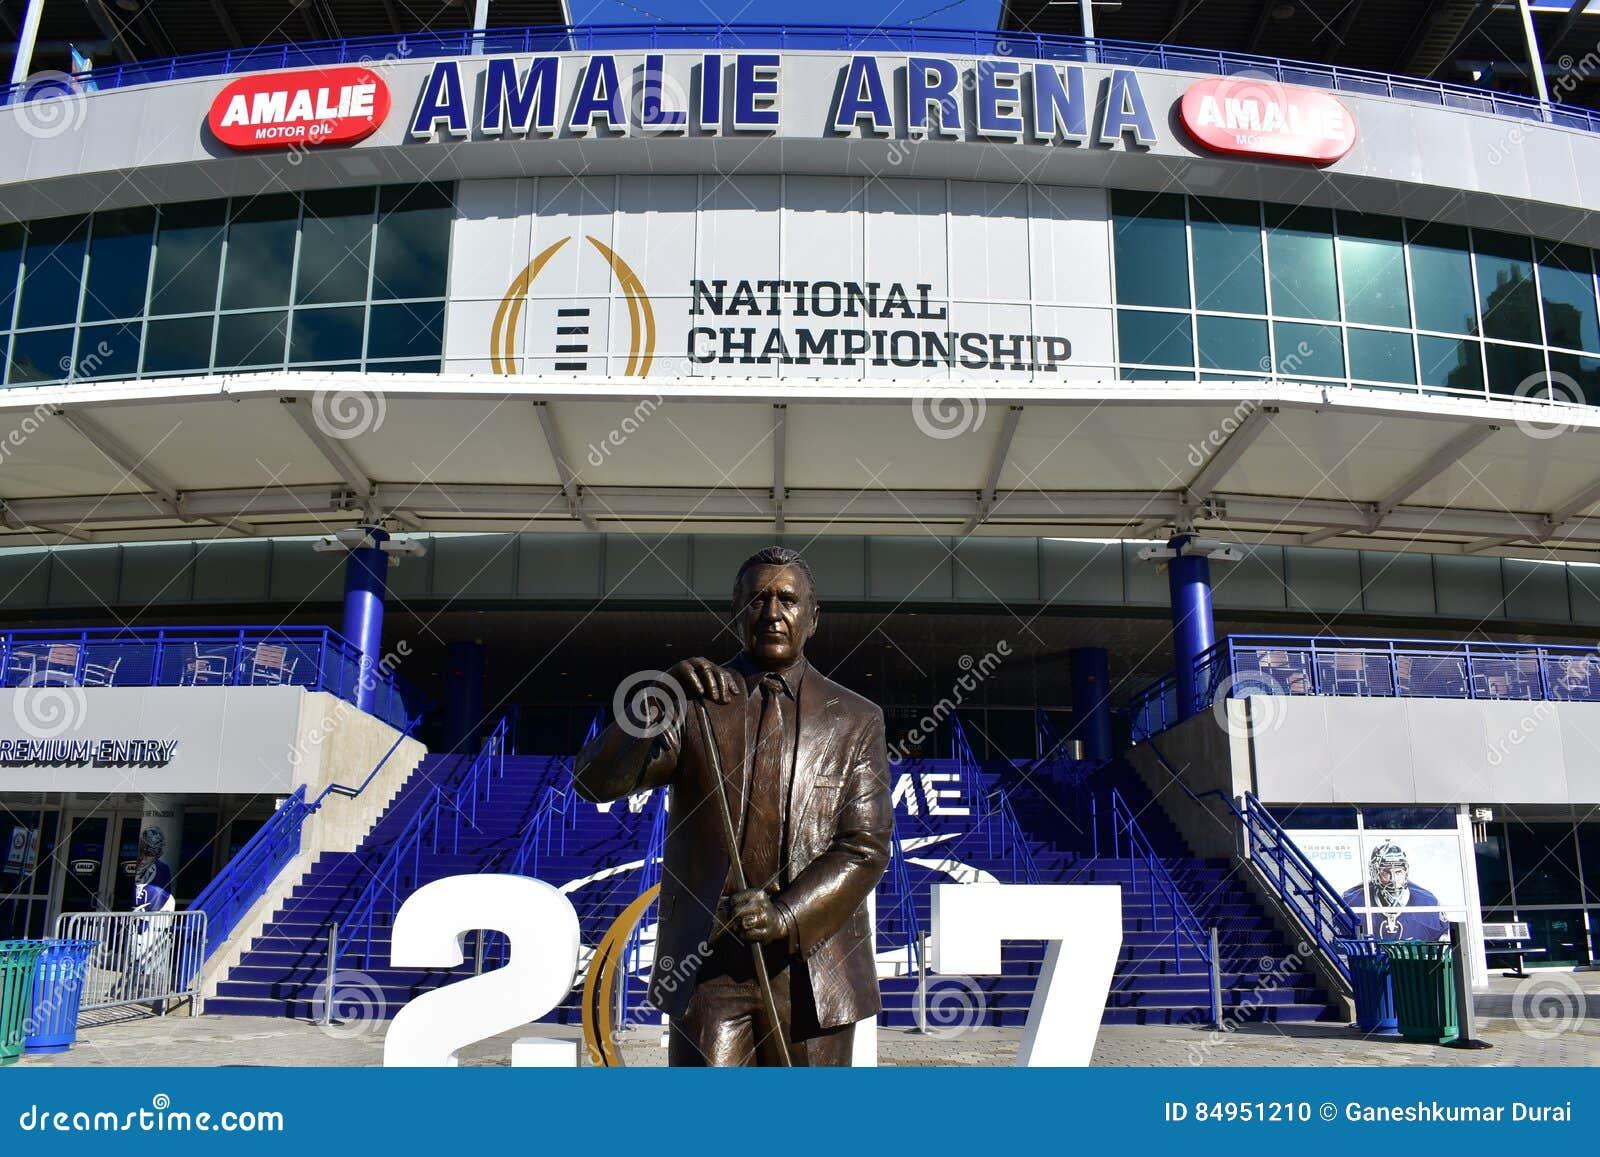 Amalie Arena Tampa